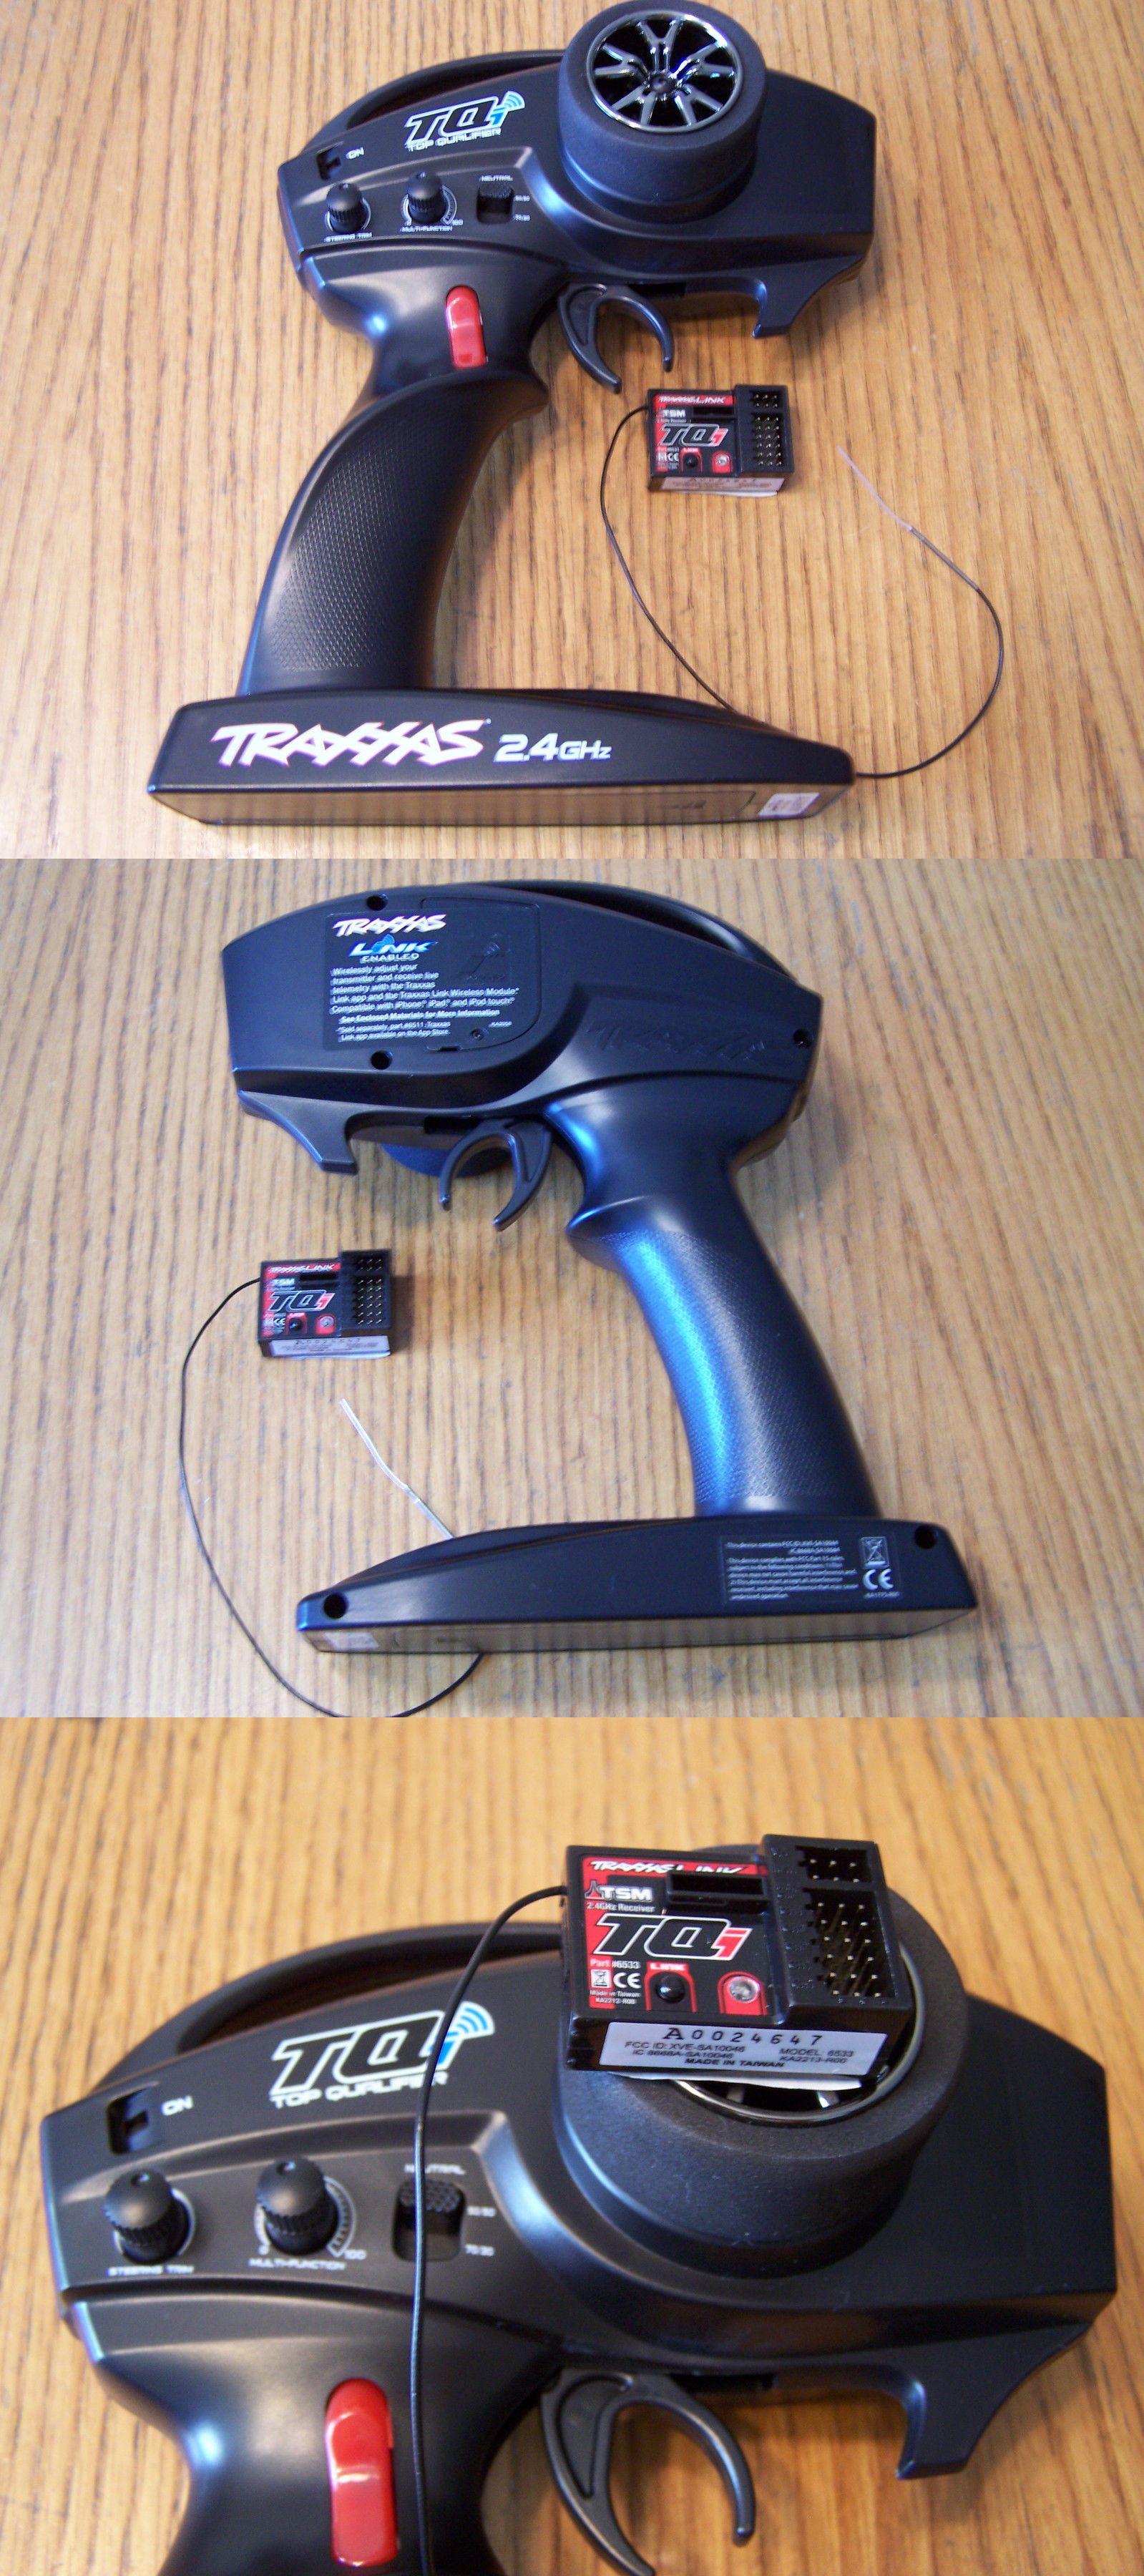 Control Radio and Electronics 19839 Traxxas Tqi Bluetooth